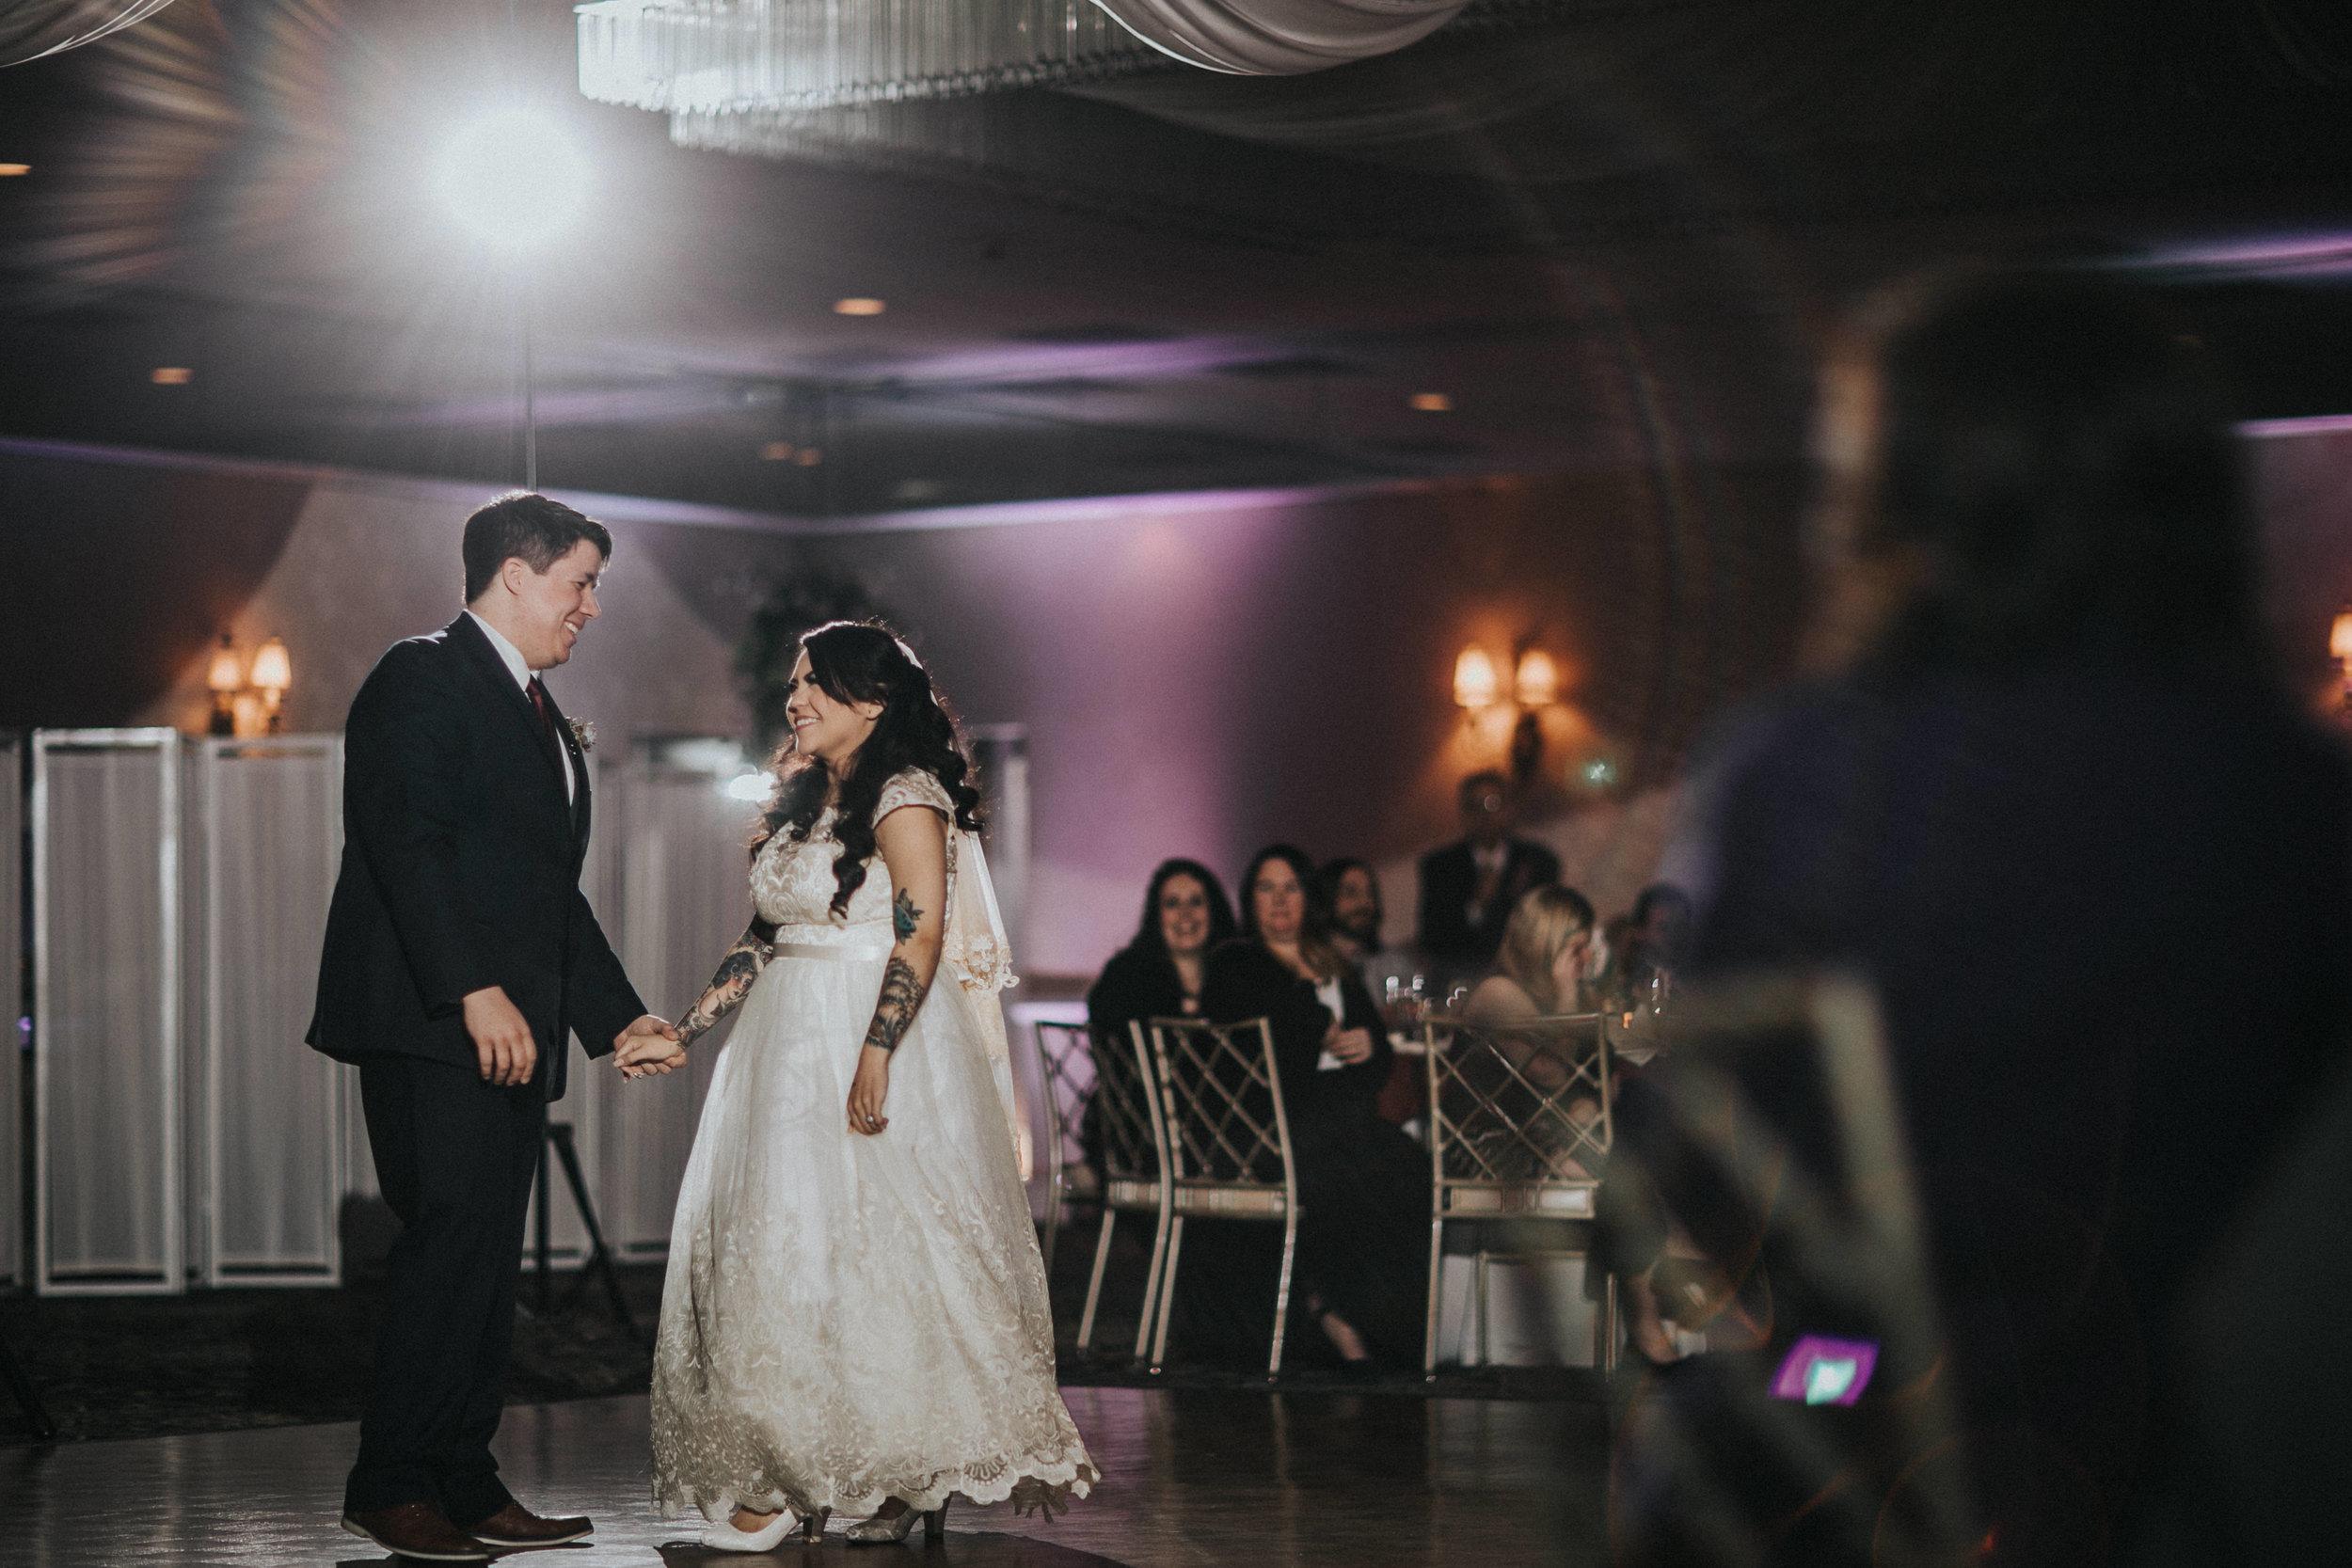 New-Jersey-Wedding-Photographer-ReceptionCenter-Valeria&Mike-Reception (15 of 265).jpg